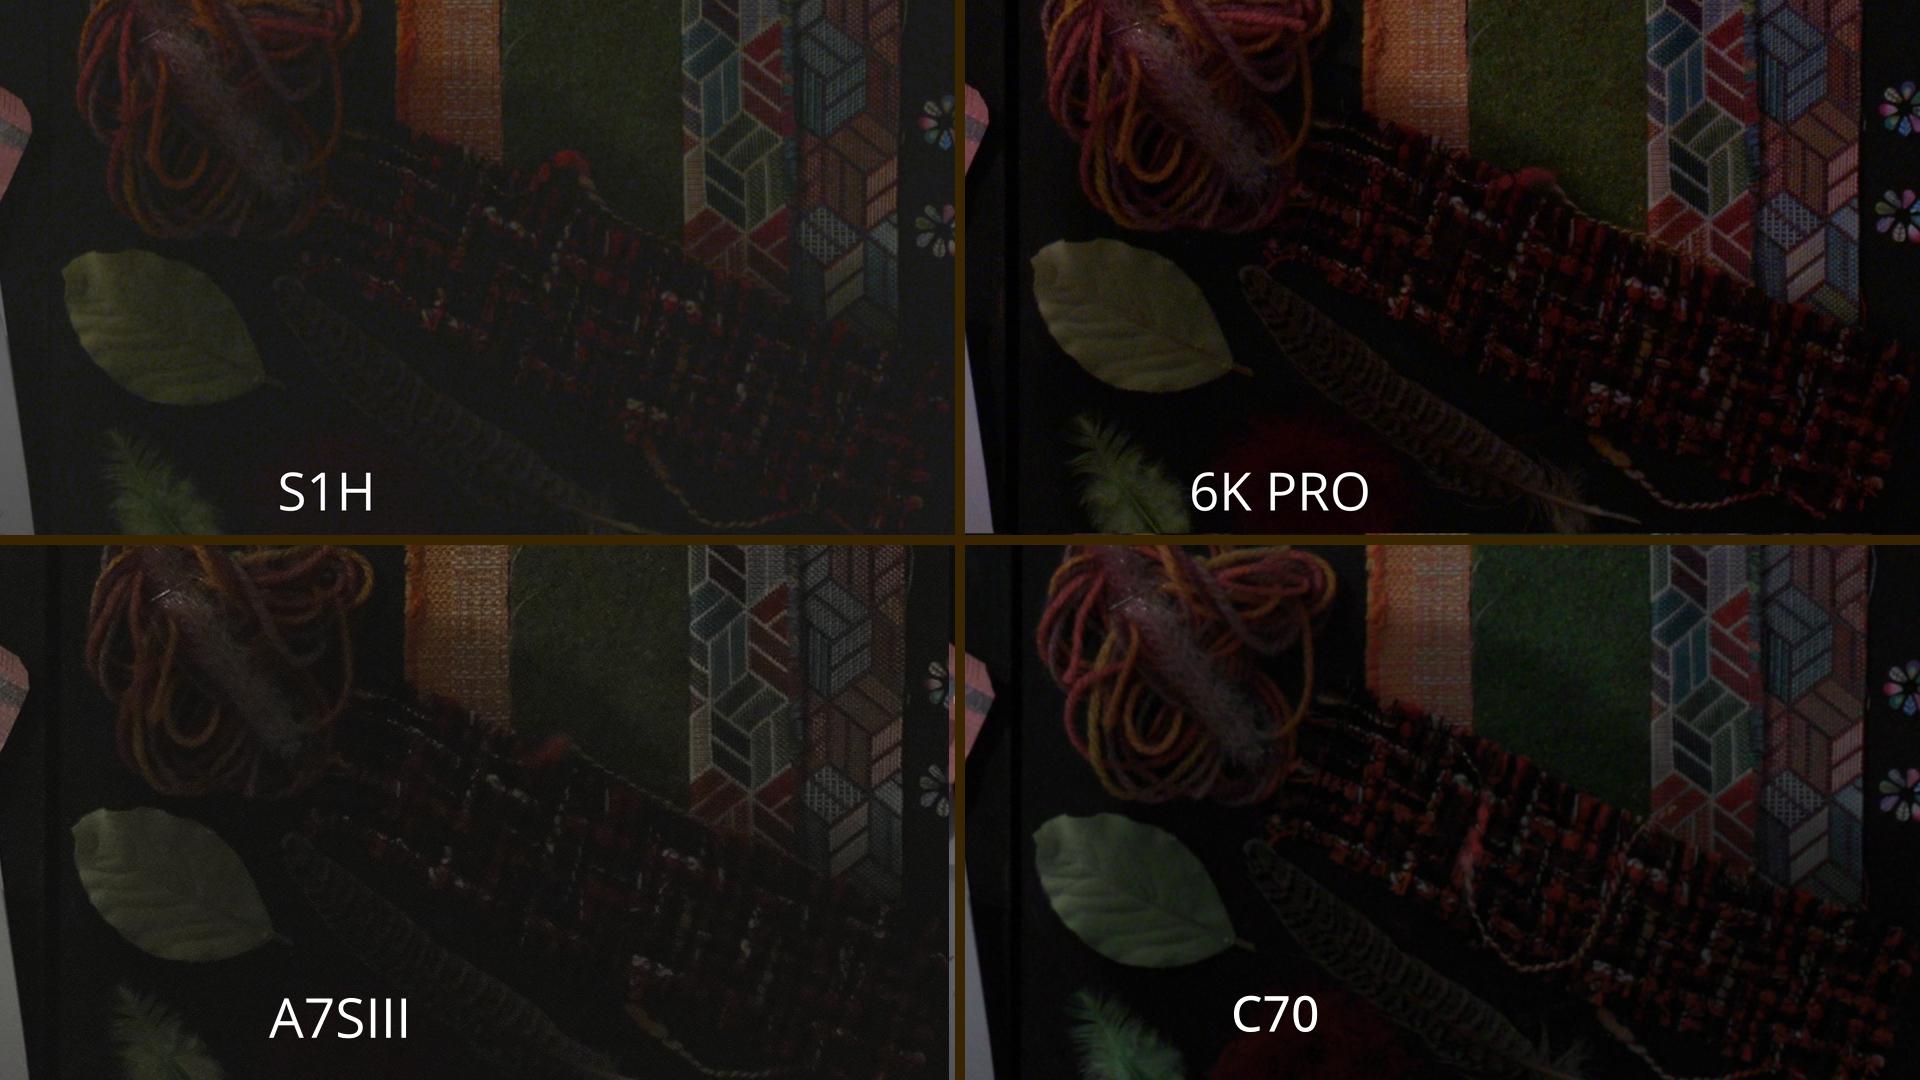 6K PRO ombre portee comp LL_4.12.1.jpg